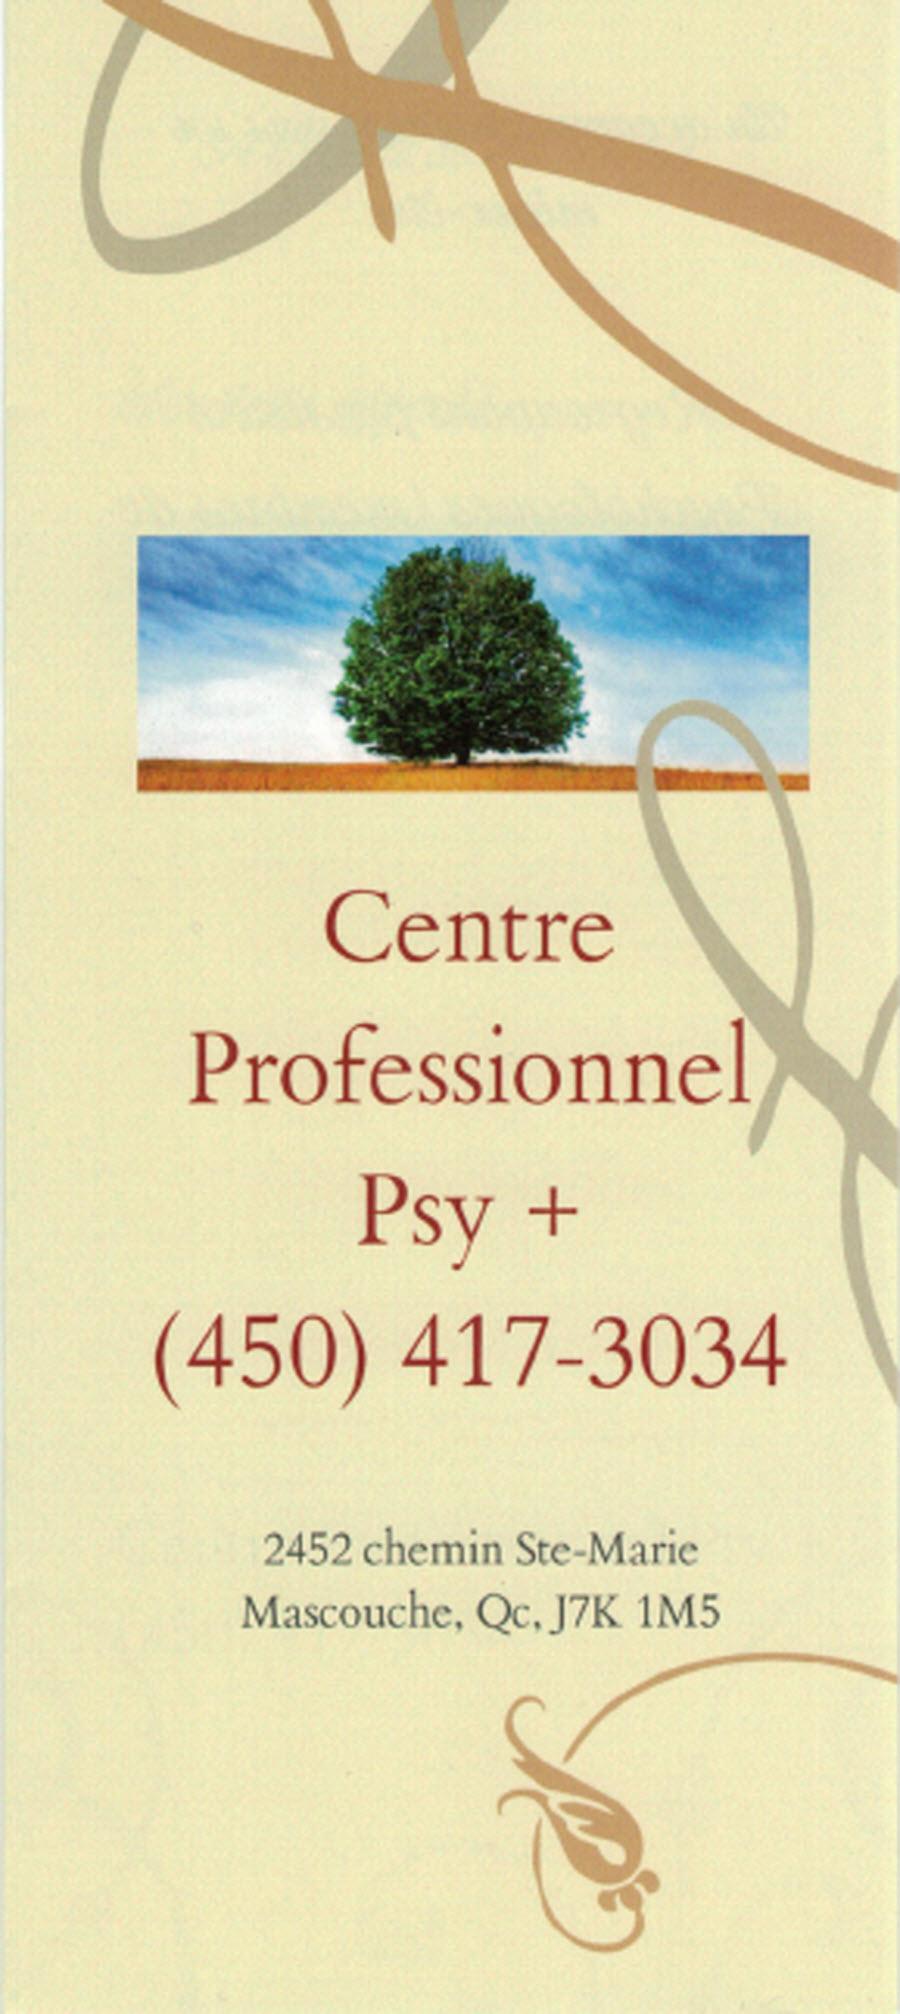 Centre professionnel psy plus